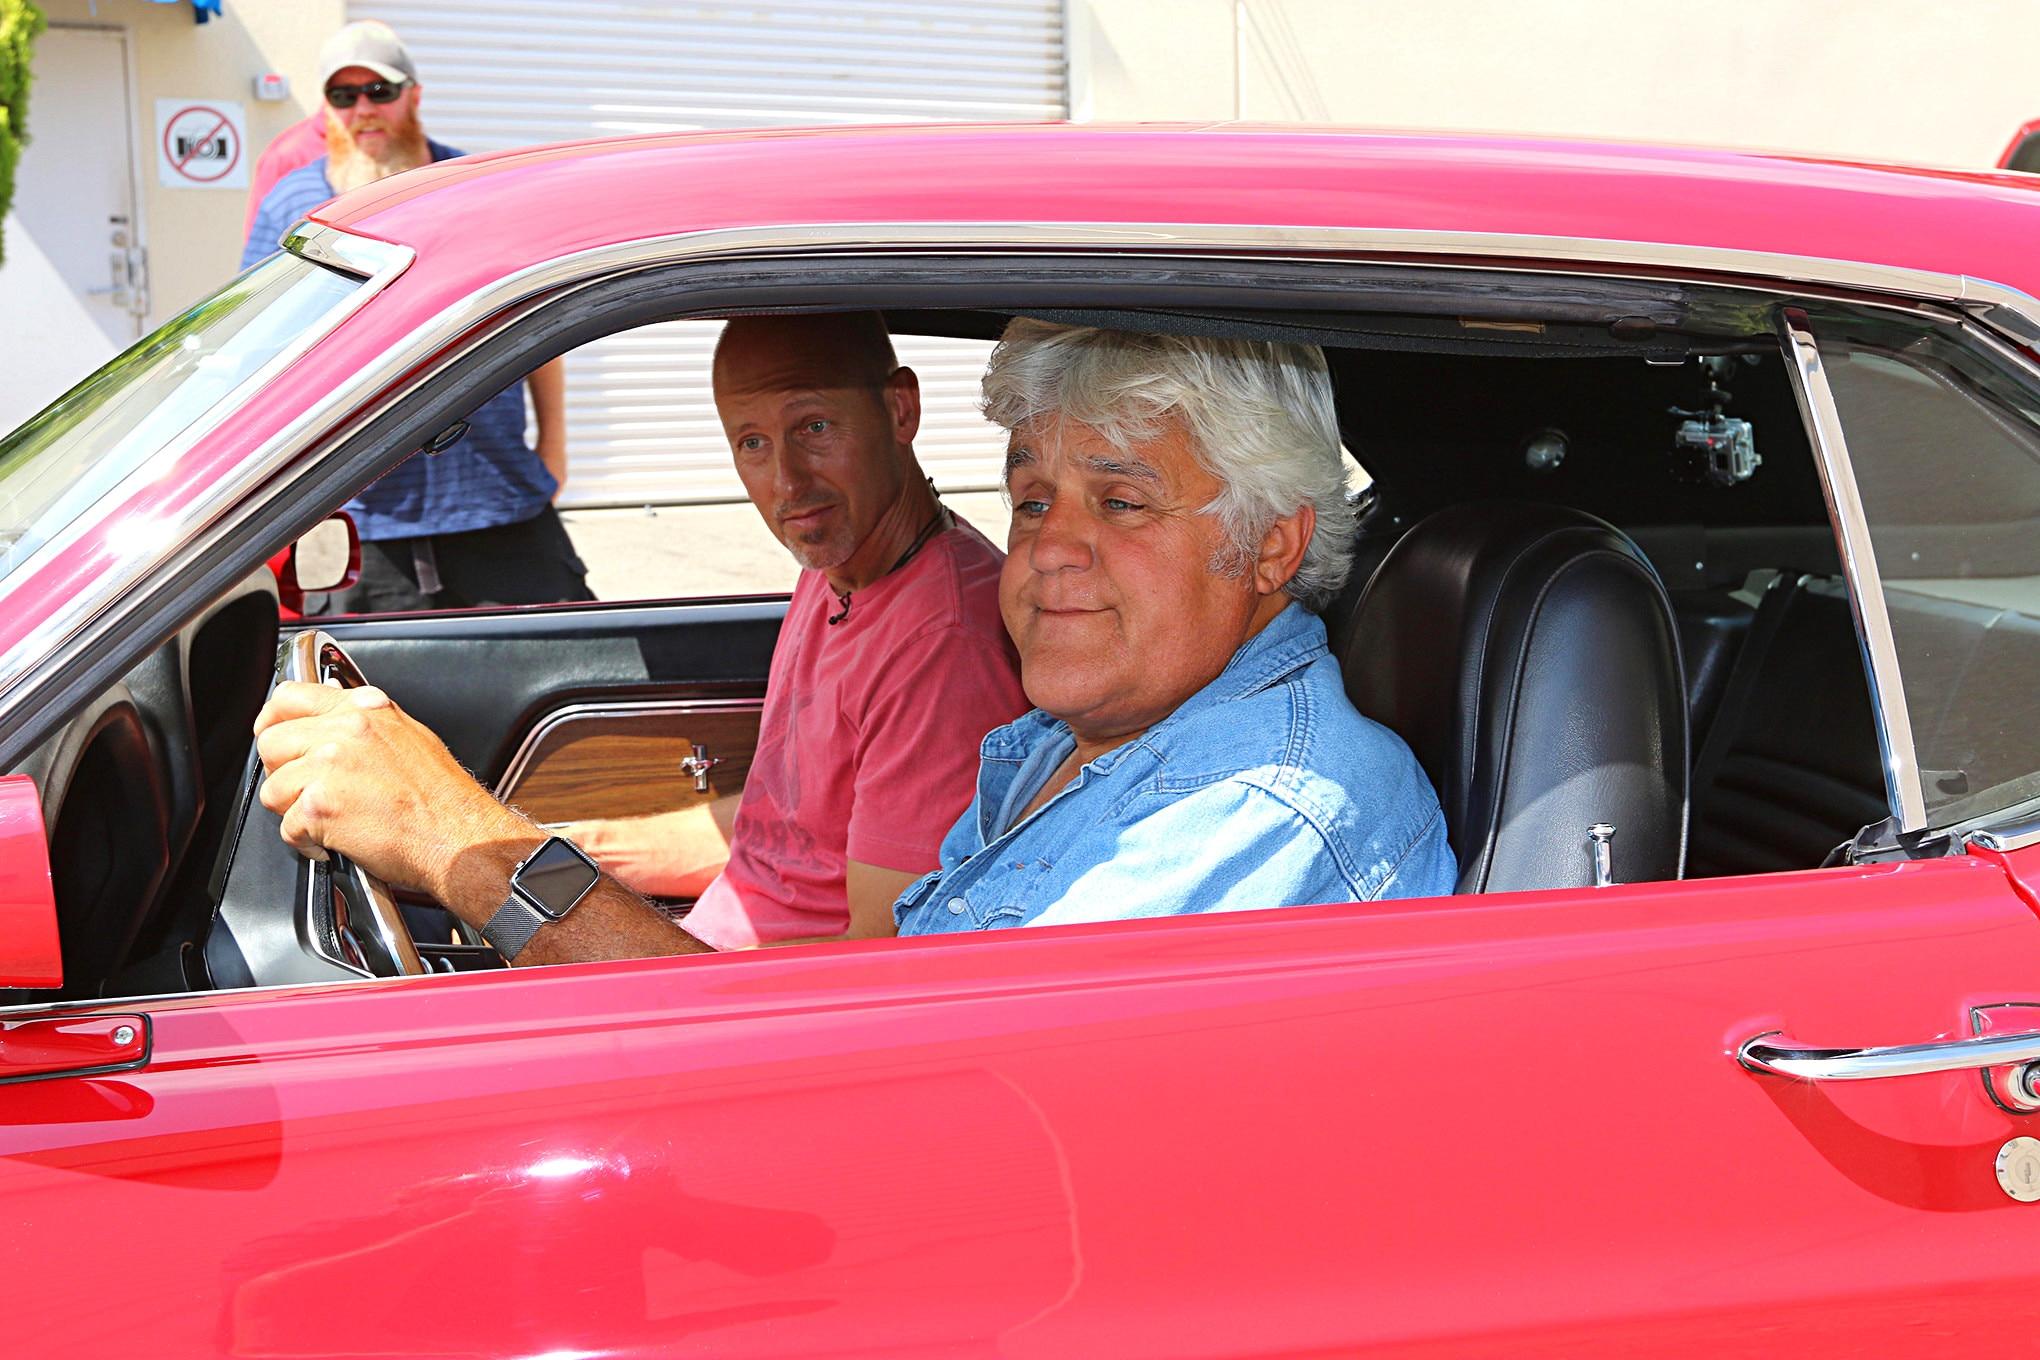 1969 Ford Mustang Boss 429 Jay Leno Garage 015